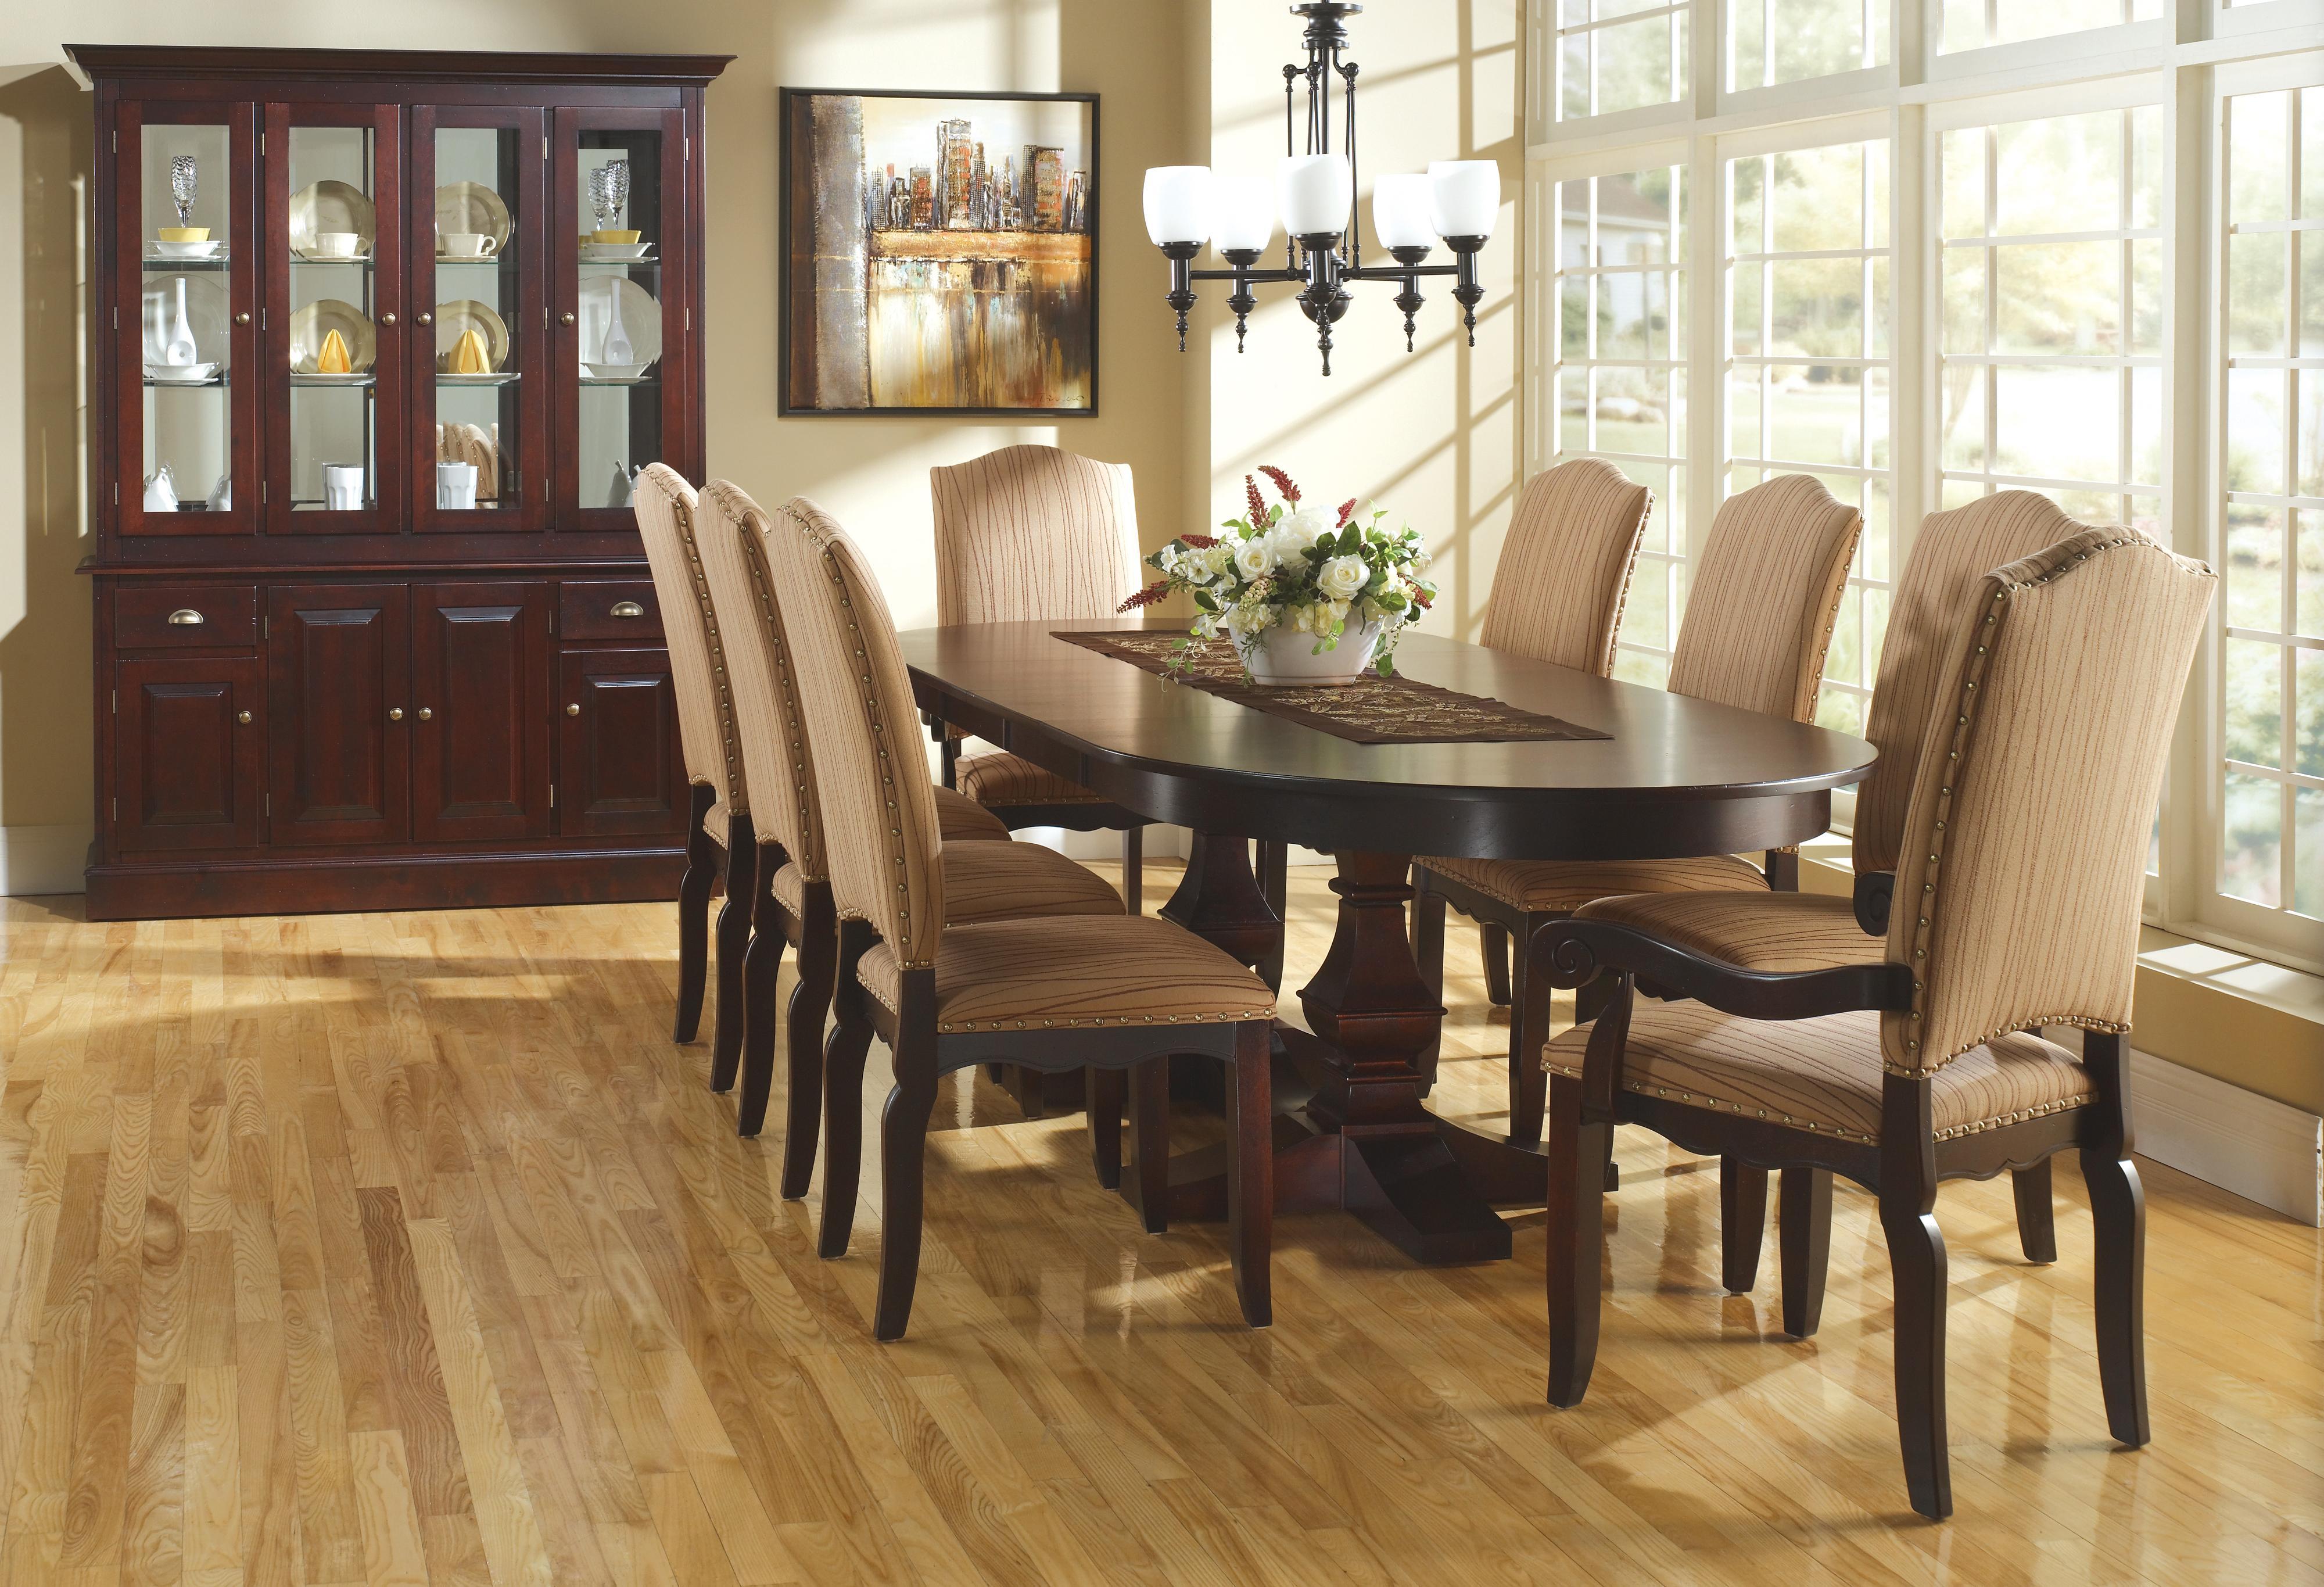 Custom Dining Set 22 By Canadel Steger S Furniture